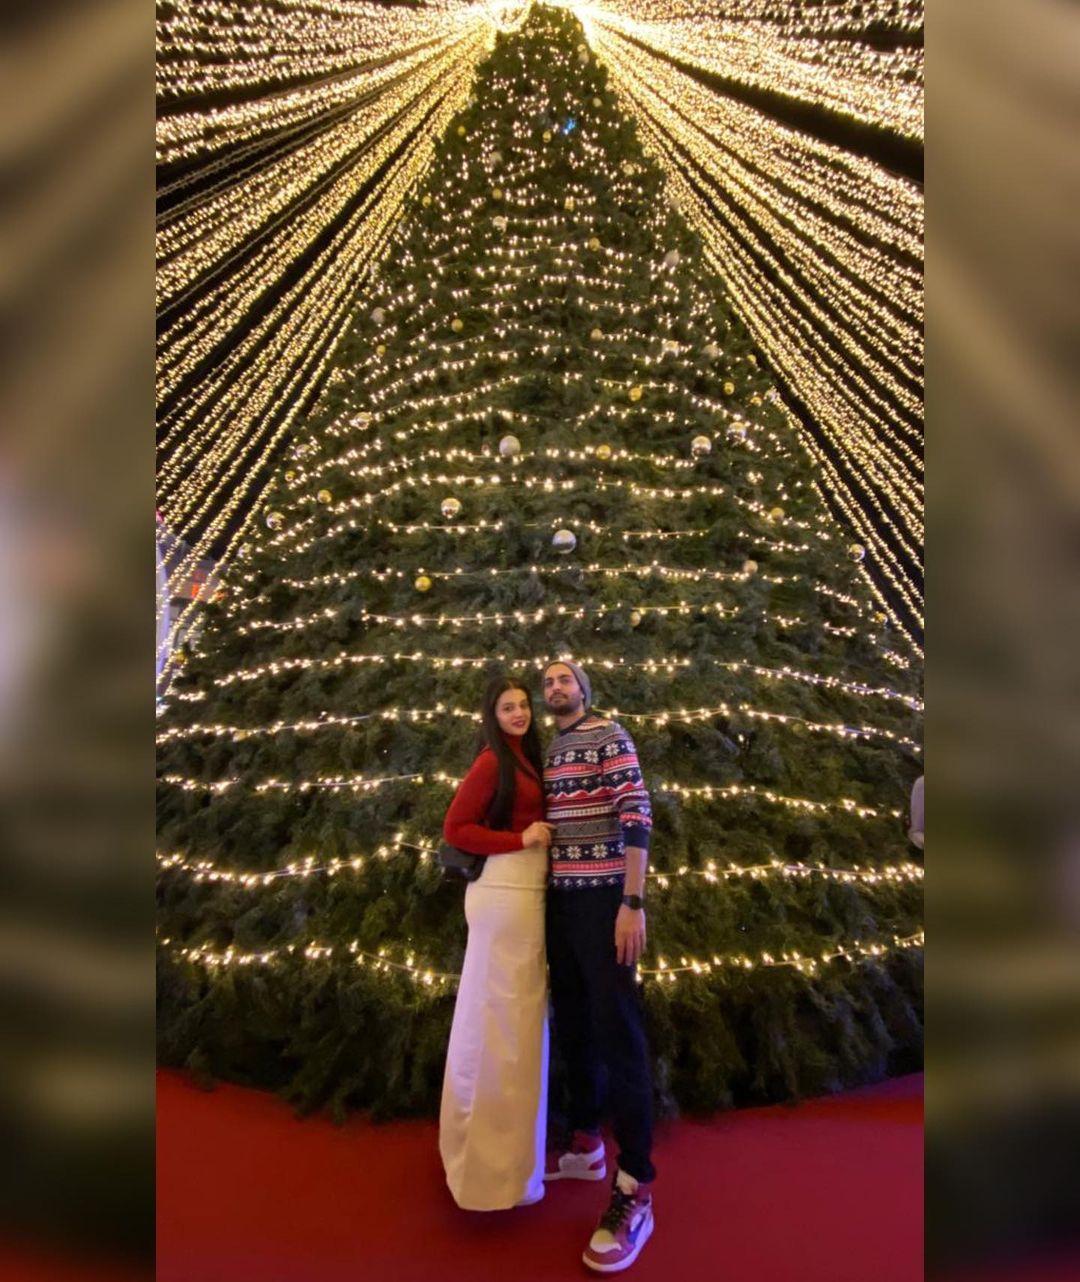 Zara Noor Abbas and Asad Siddiqui in Dubai - Latest Pictures